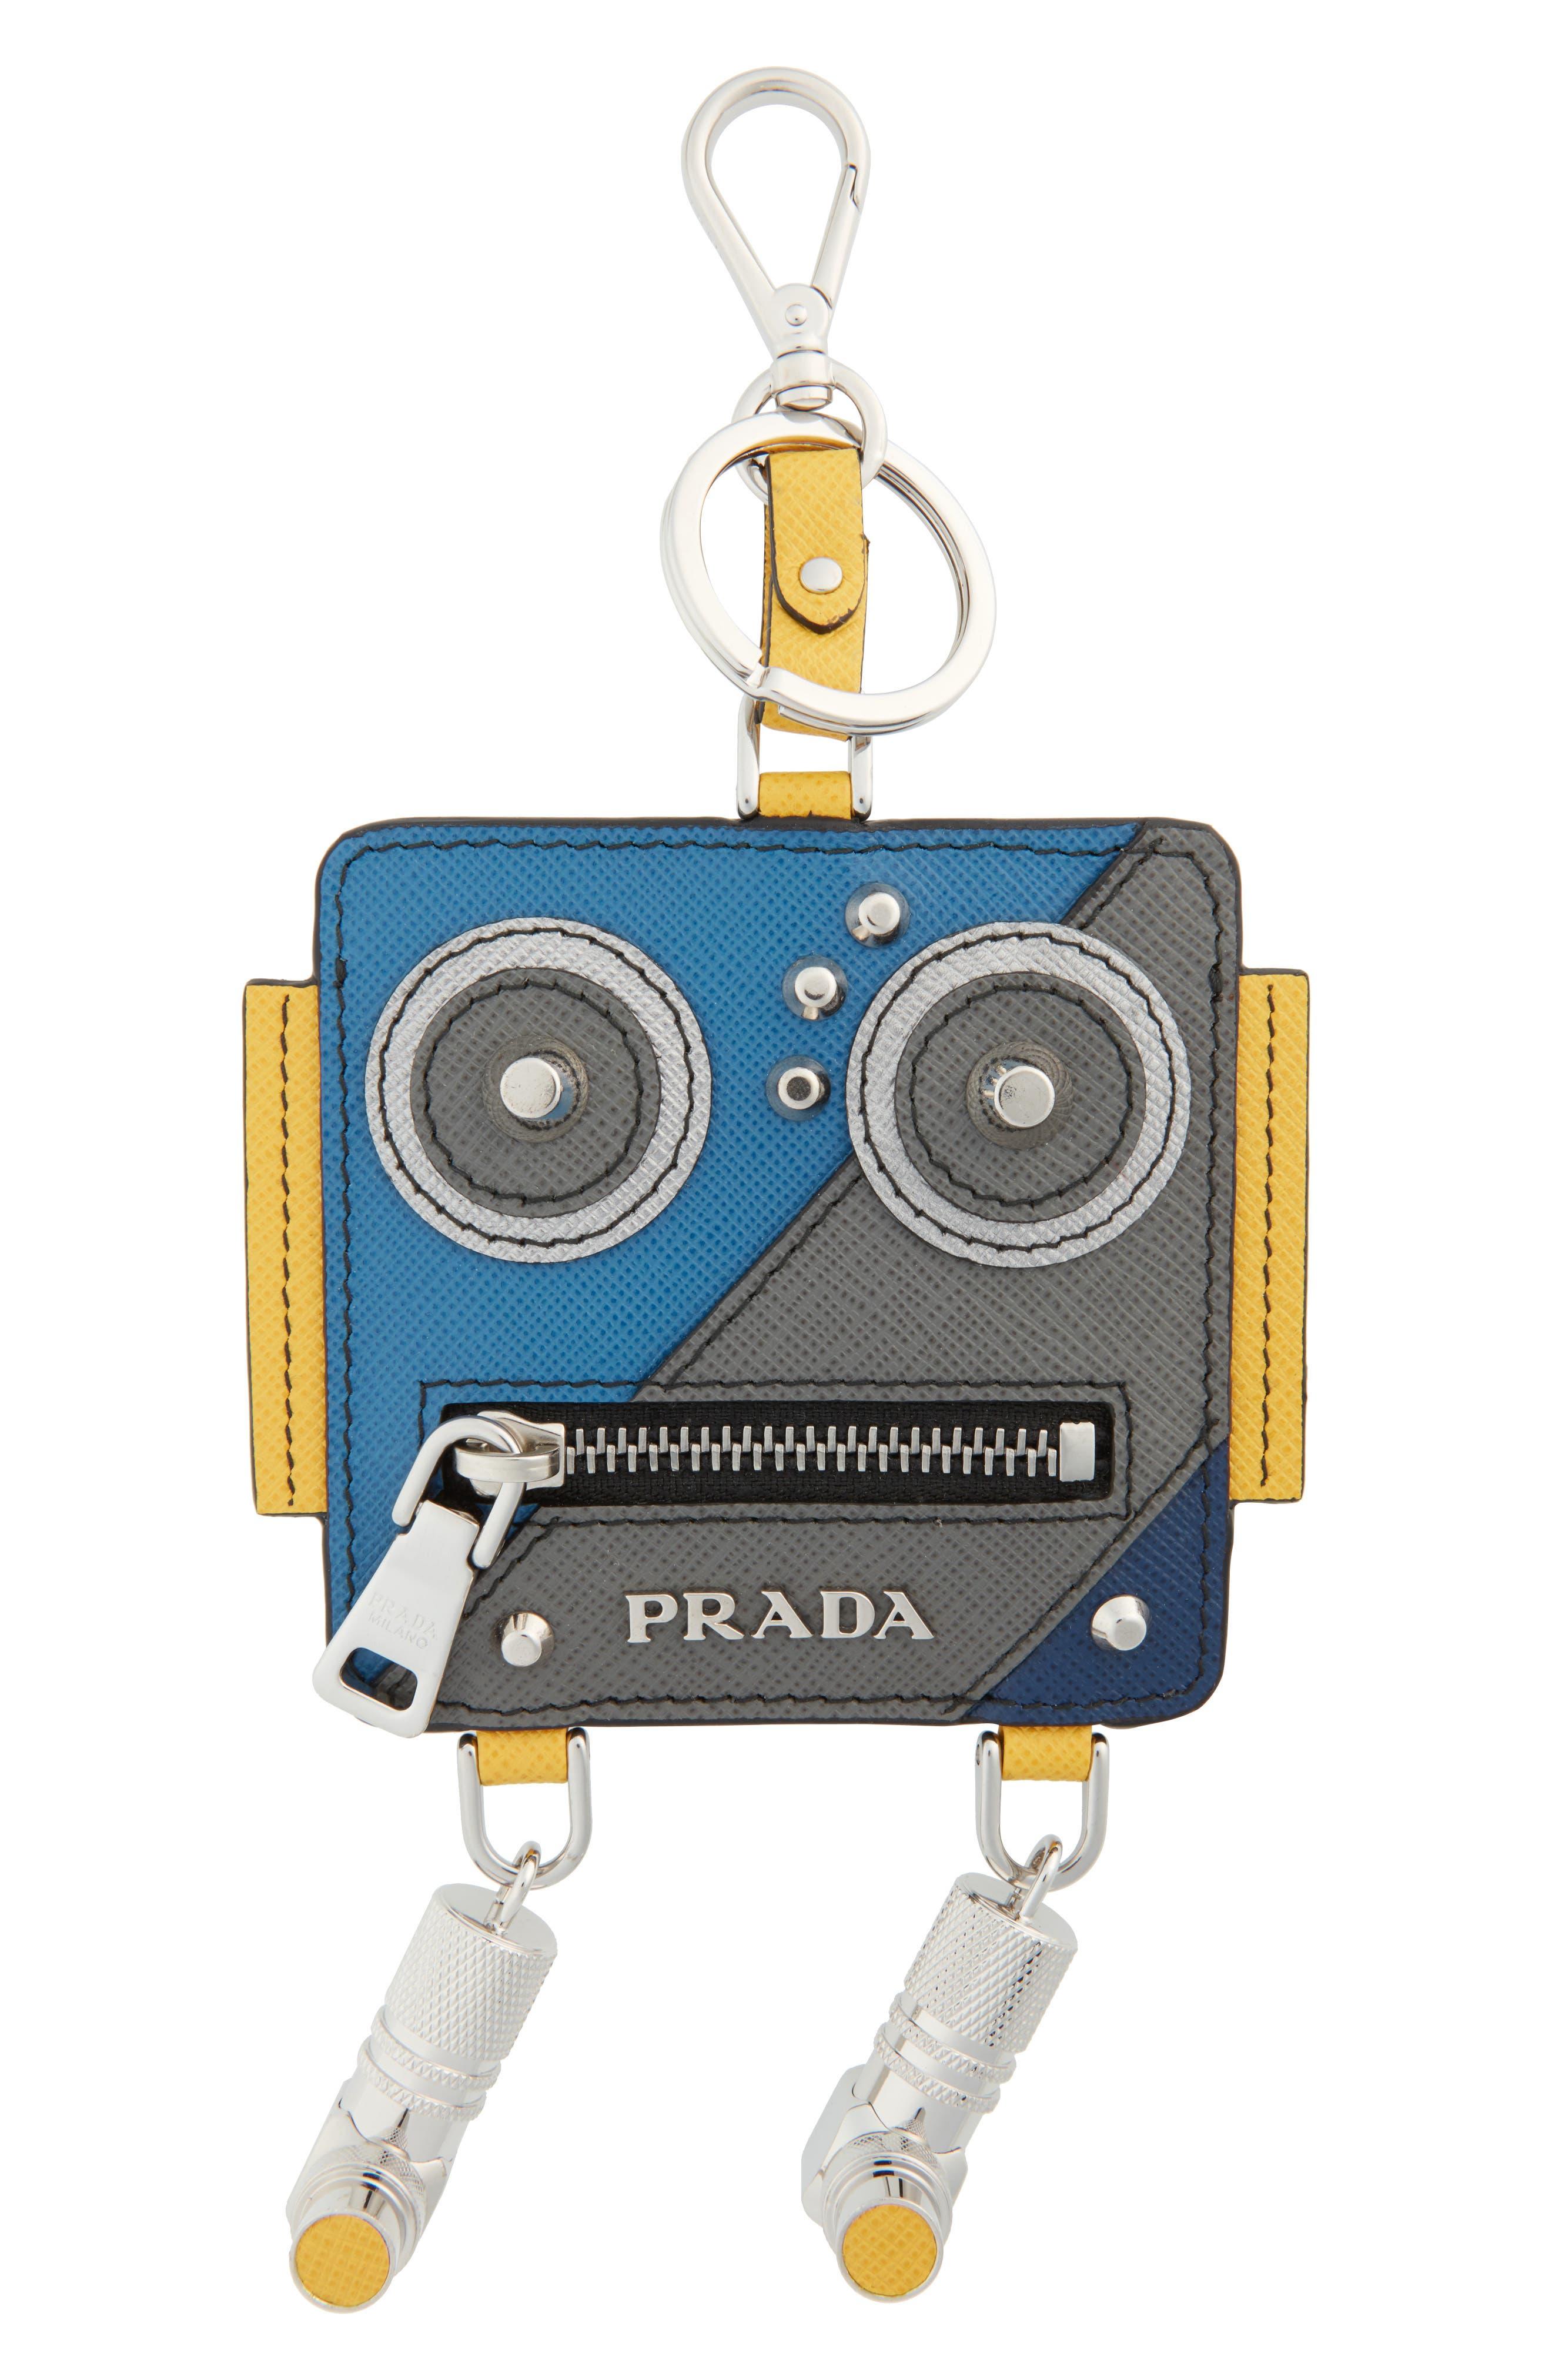 Prada Robot Leather Key Chain